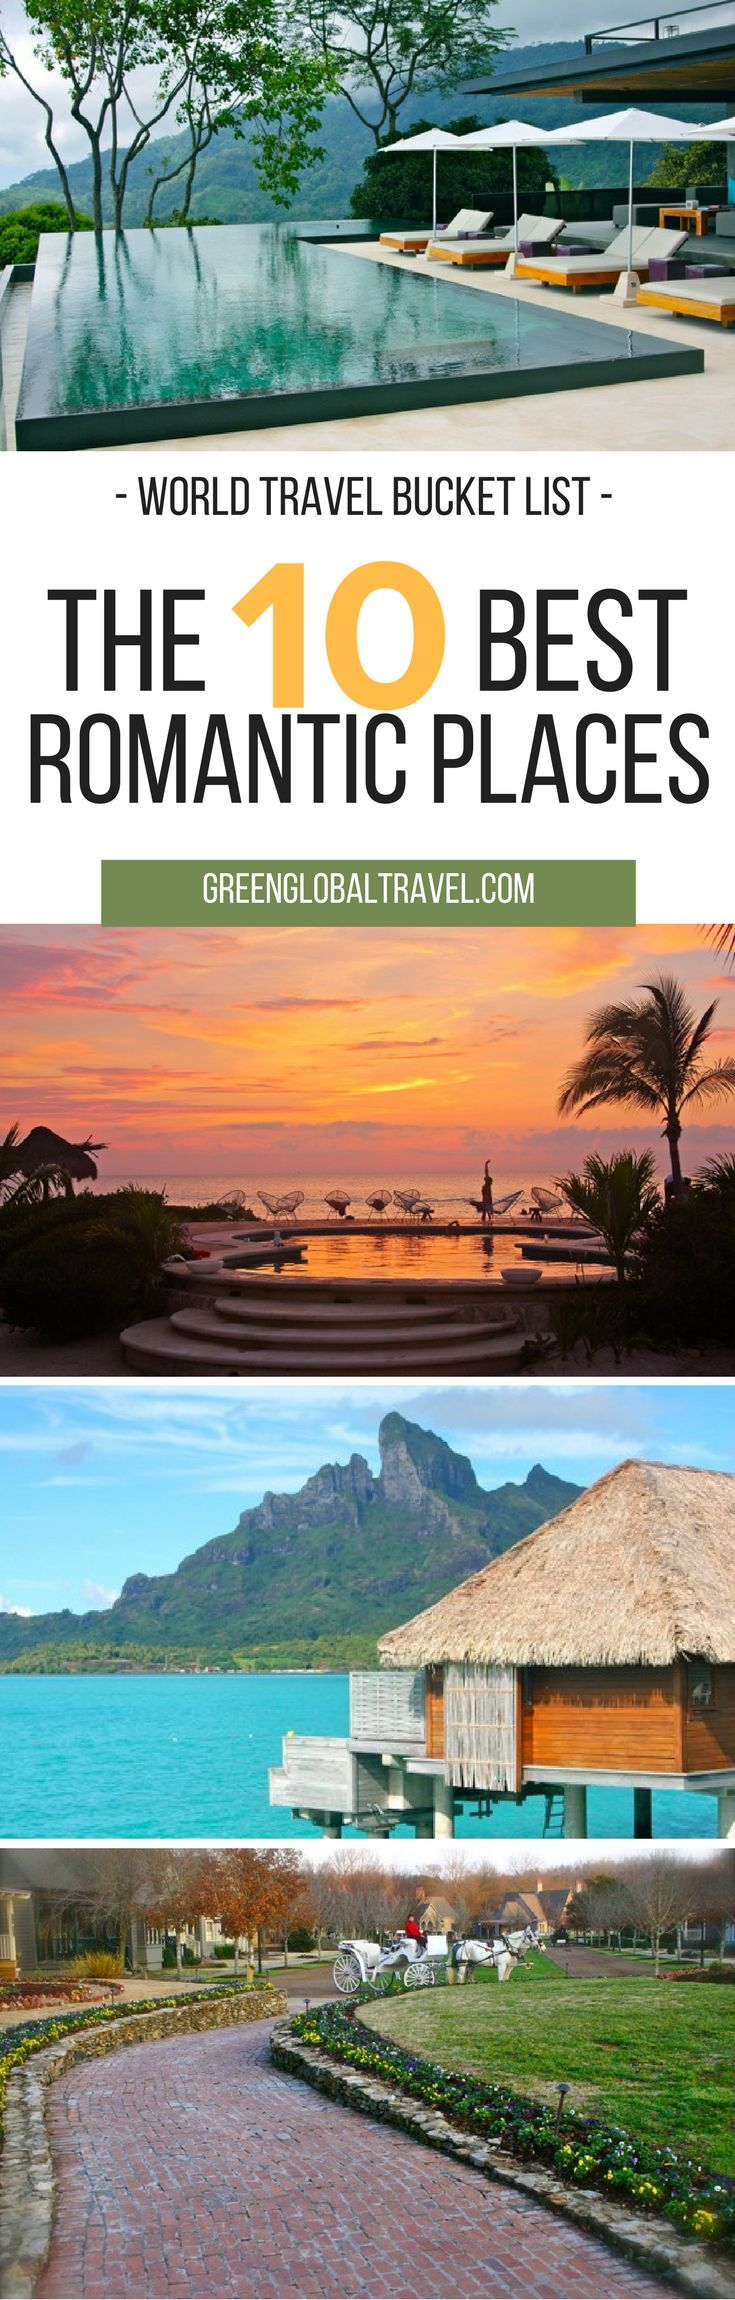 Here are our top 10 romantic places around the world for your travel bucket list! Georgia | Bora Bora | Tahiti | Panama | Islas Secas Resort | Costa Rica | Kura Design Villas | South Africa | Londolozi Game Reserve | St. Kitts | Ottley's Plantation Inn | Chile | Patagonia Camp | Shangri'La | Dominican Republic | Mexico |